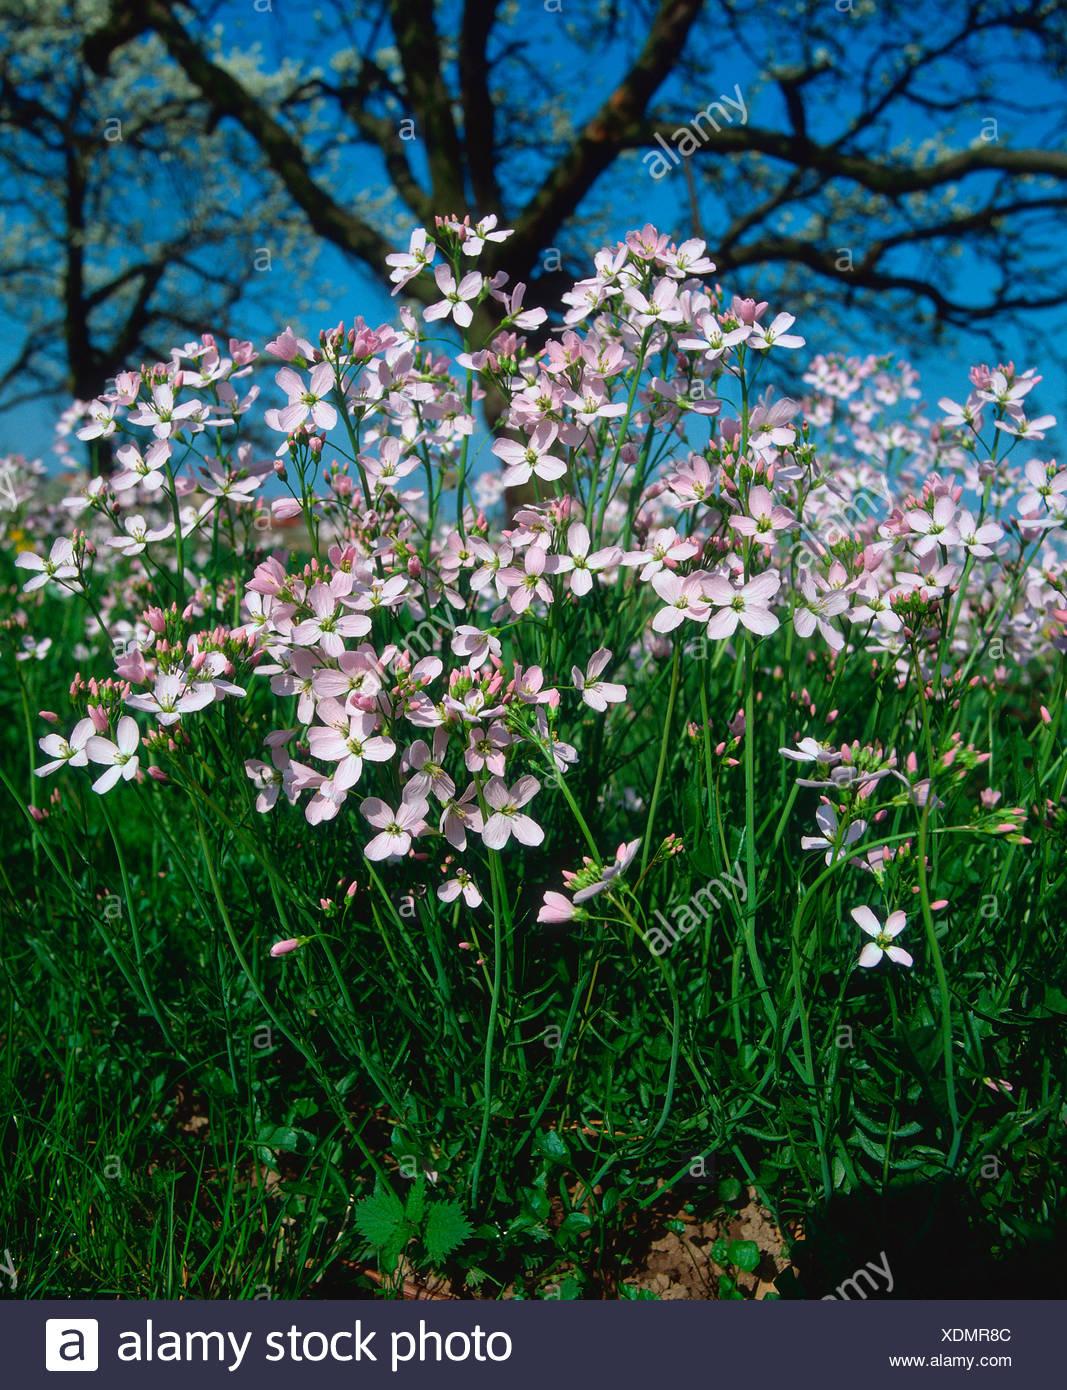 Cuckoo Flower Stock Photo